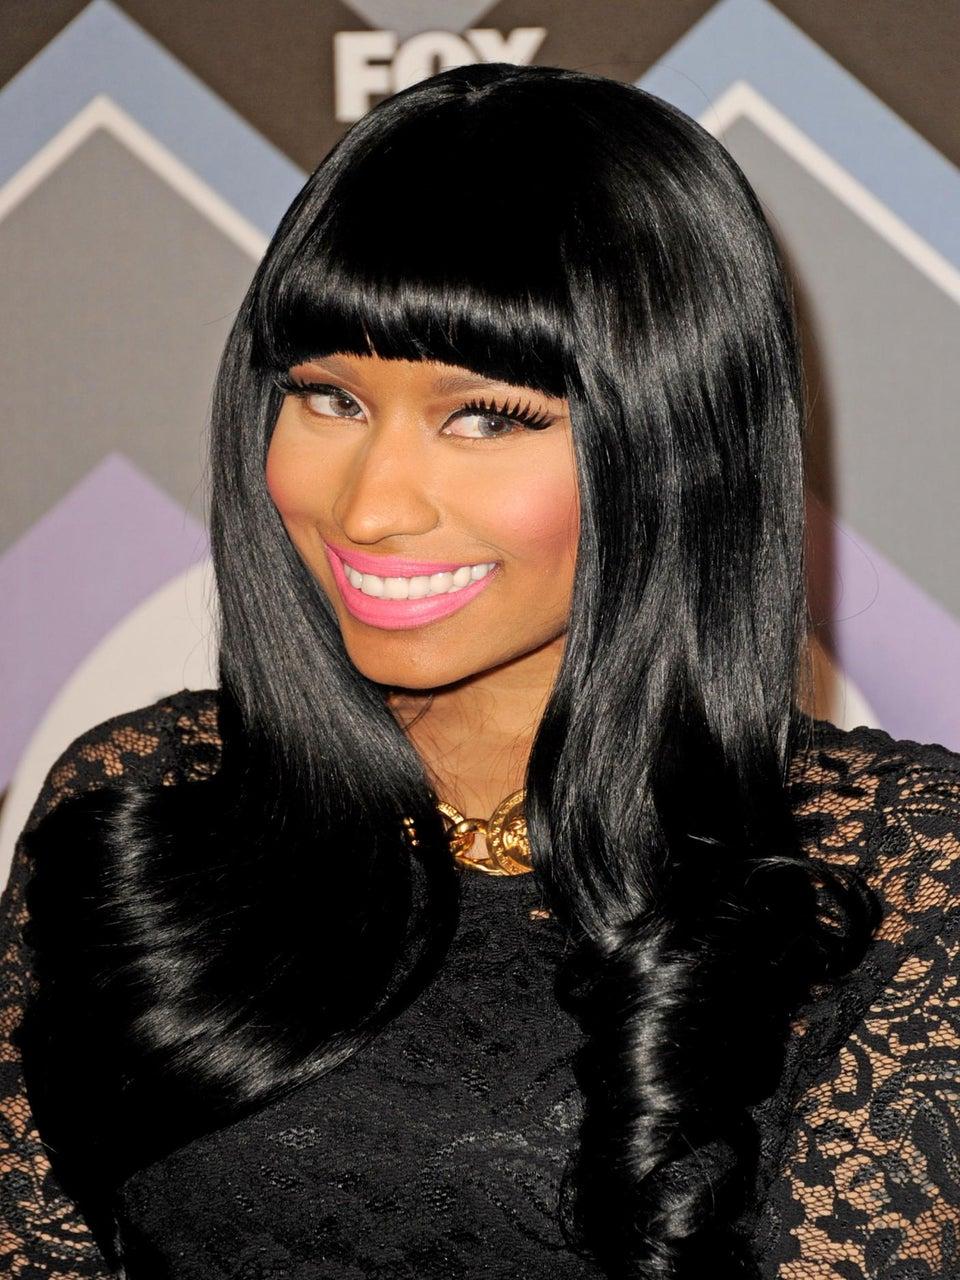 Nicki Minaj Compares Music Industry to High School